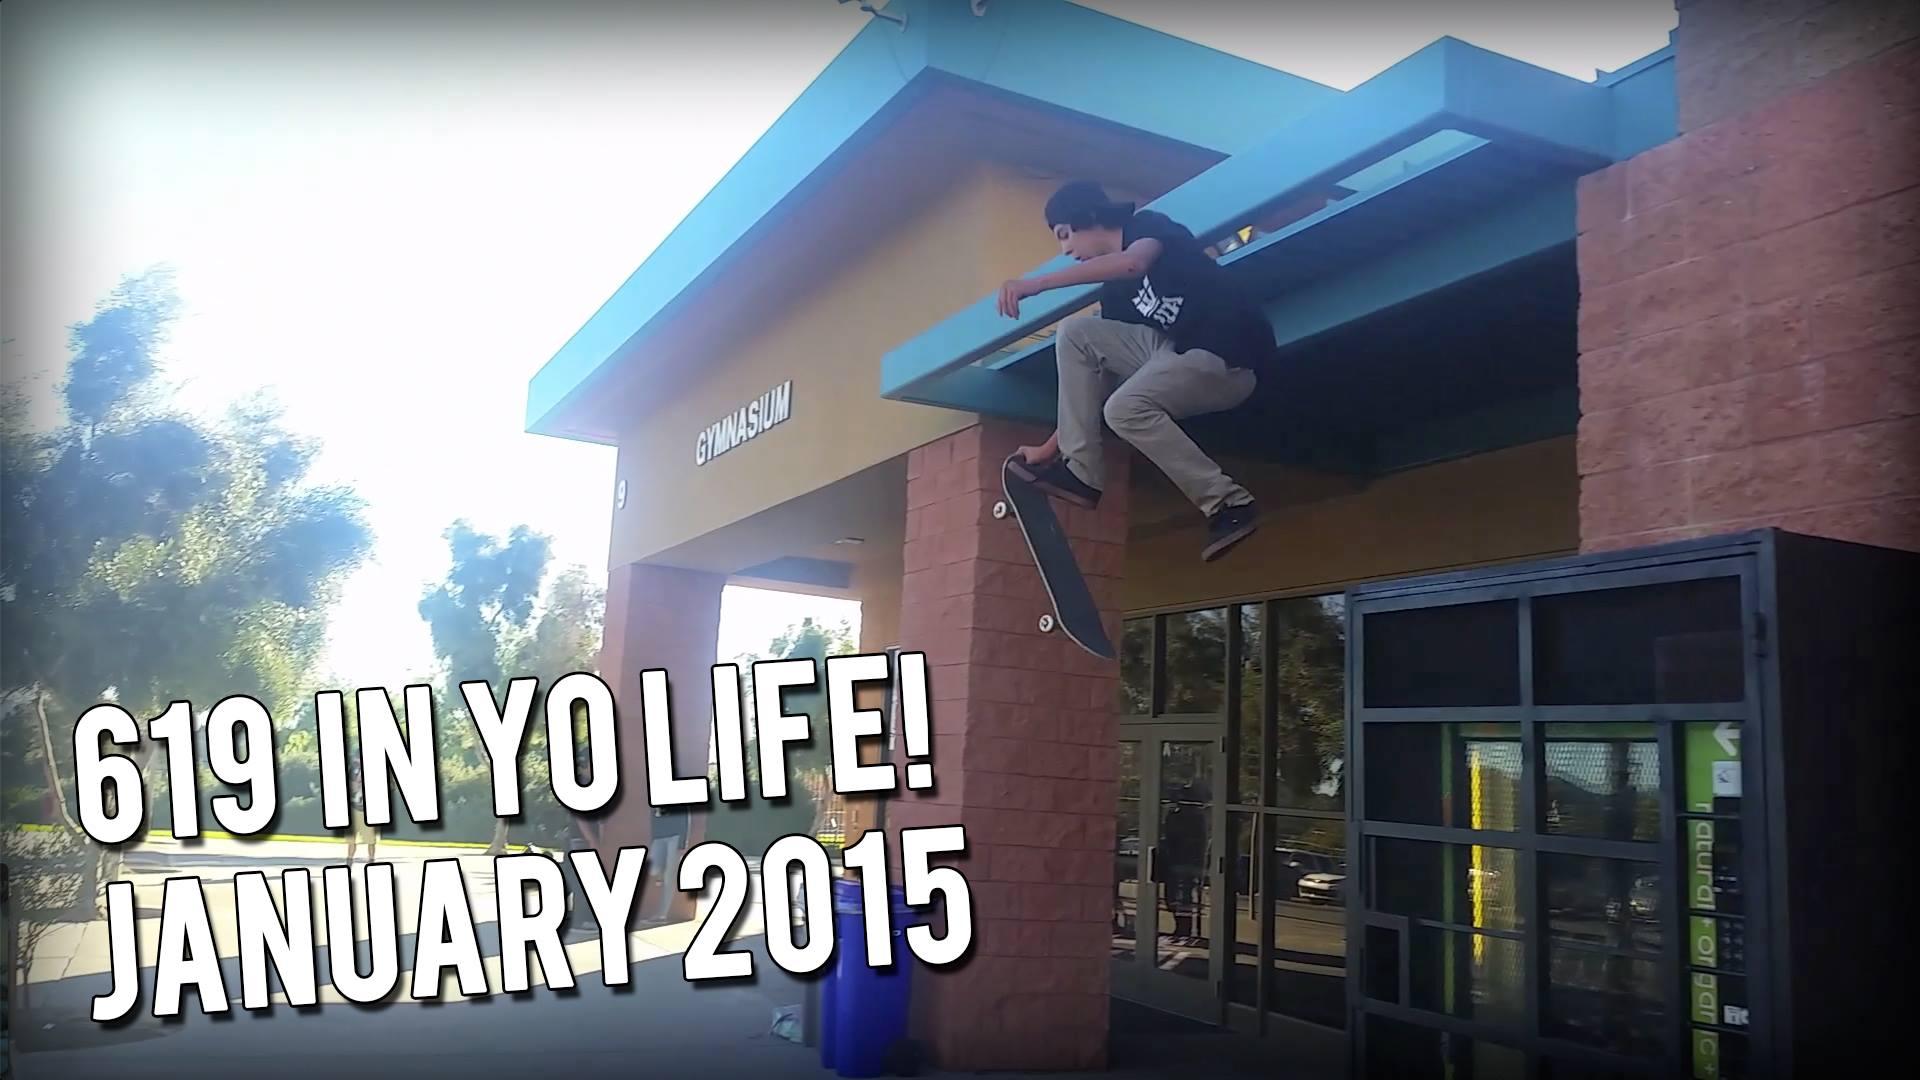 619 IN YO LIFE! JAN 2015